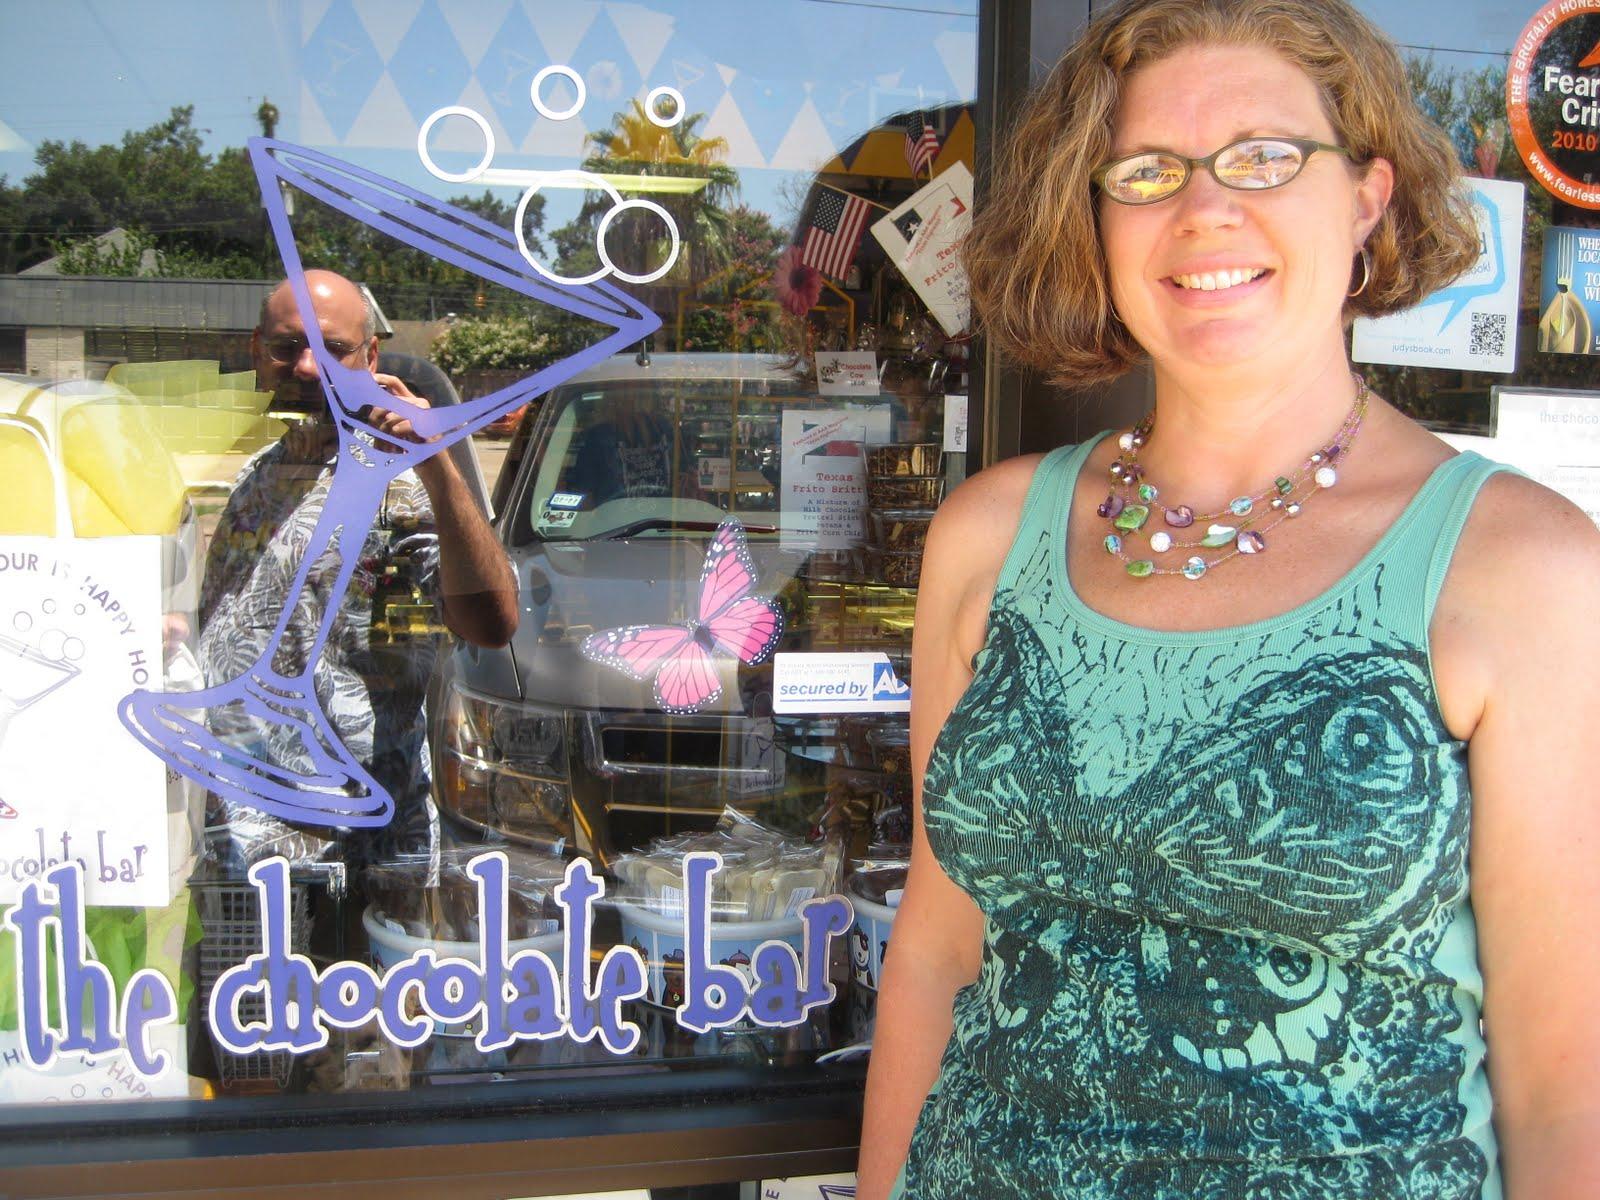 Heidi's Recipes: The Chocolate Bar in Houston Texas